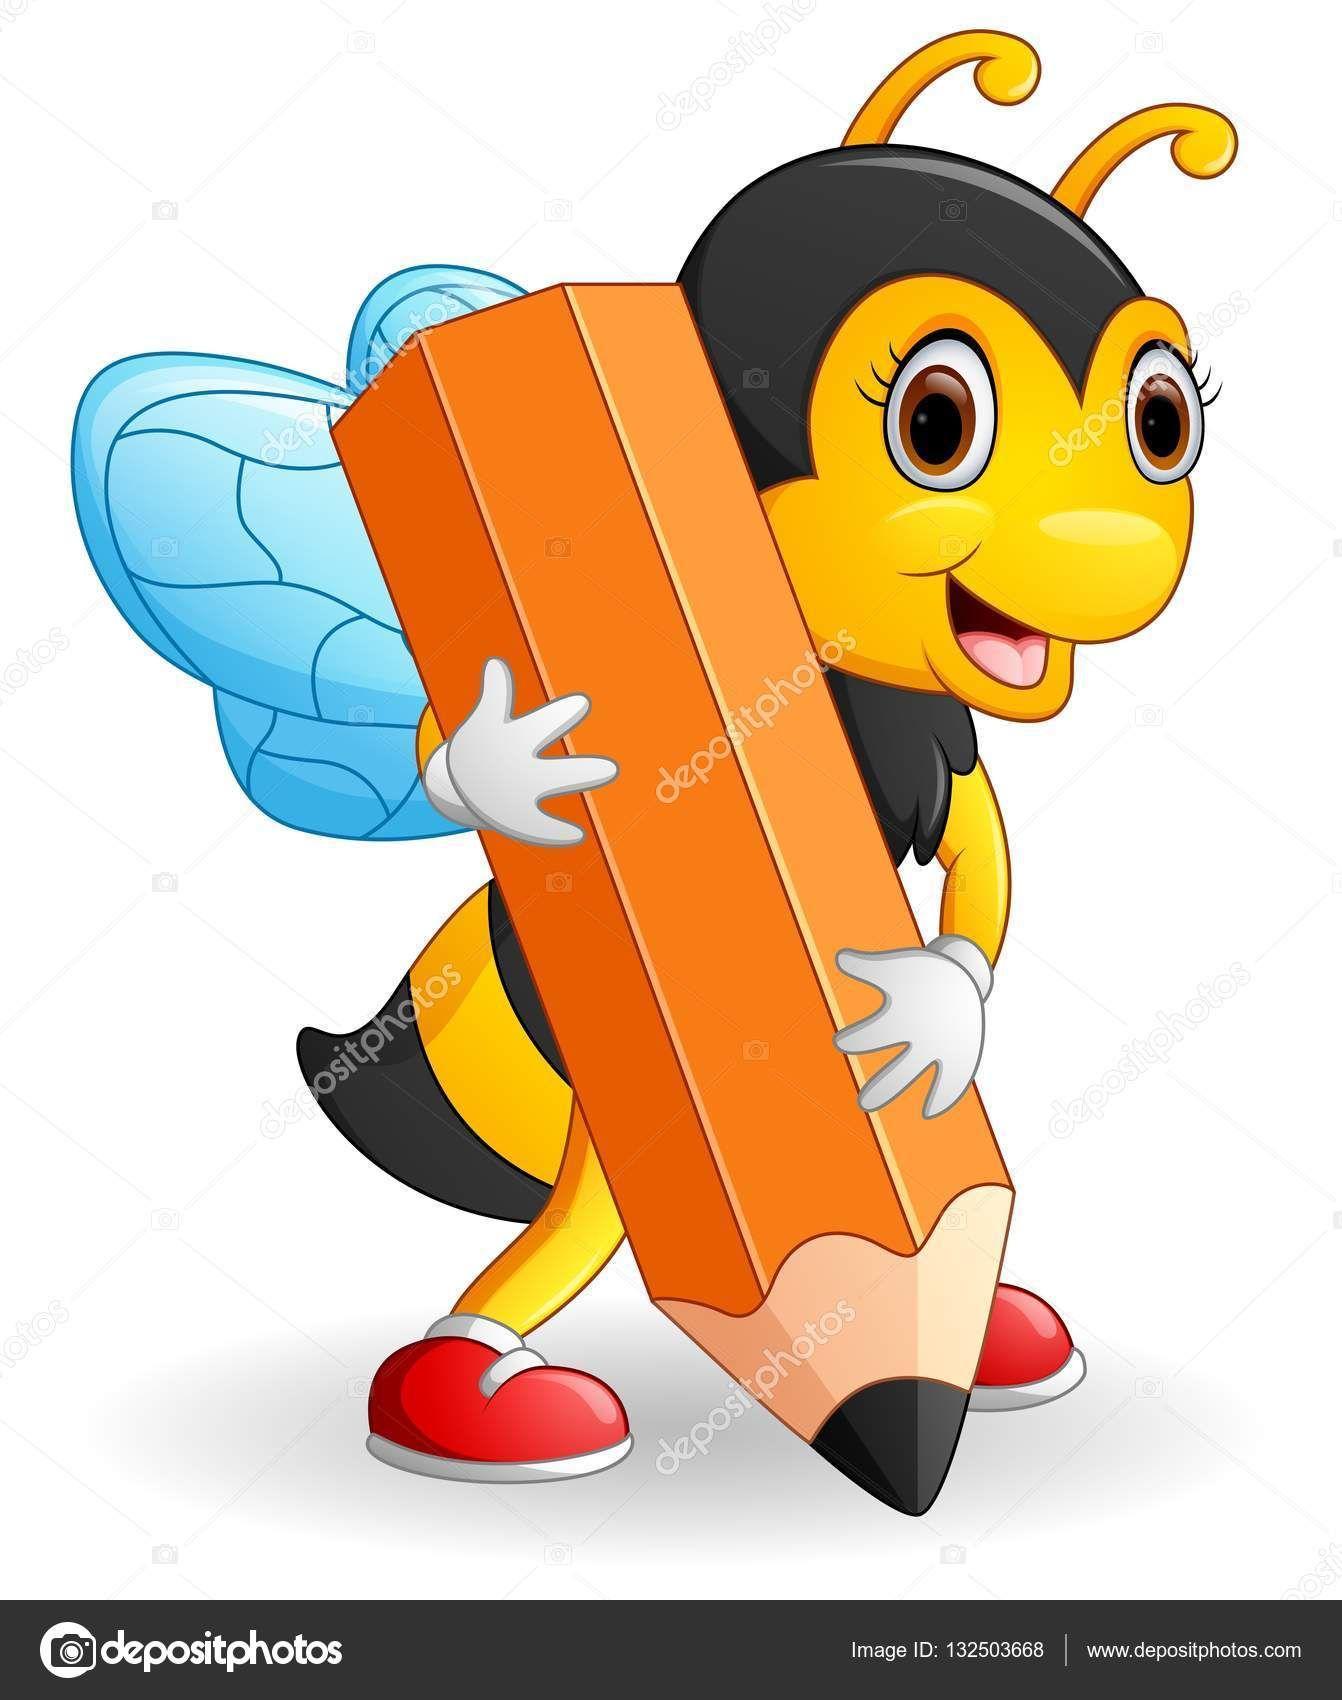 Descargar - Lápiz de abeja de dibujos animados holding marrón ...